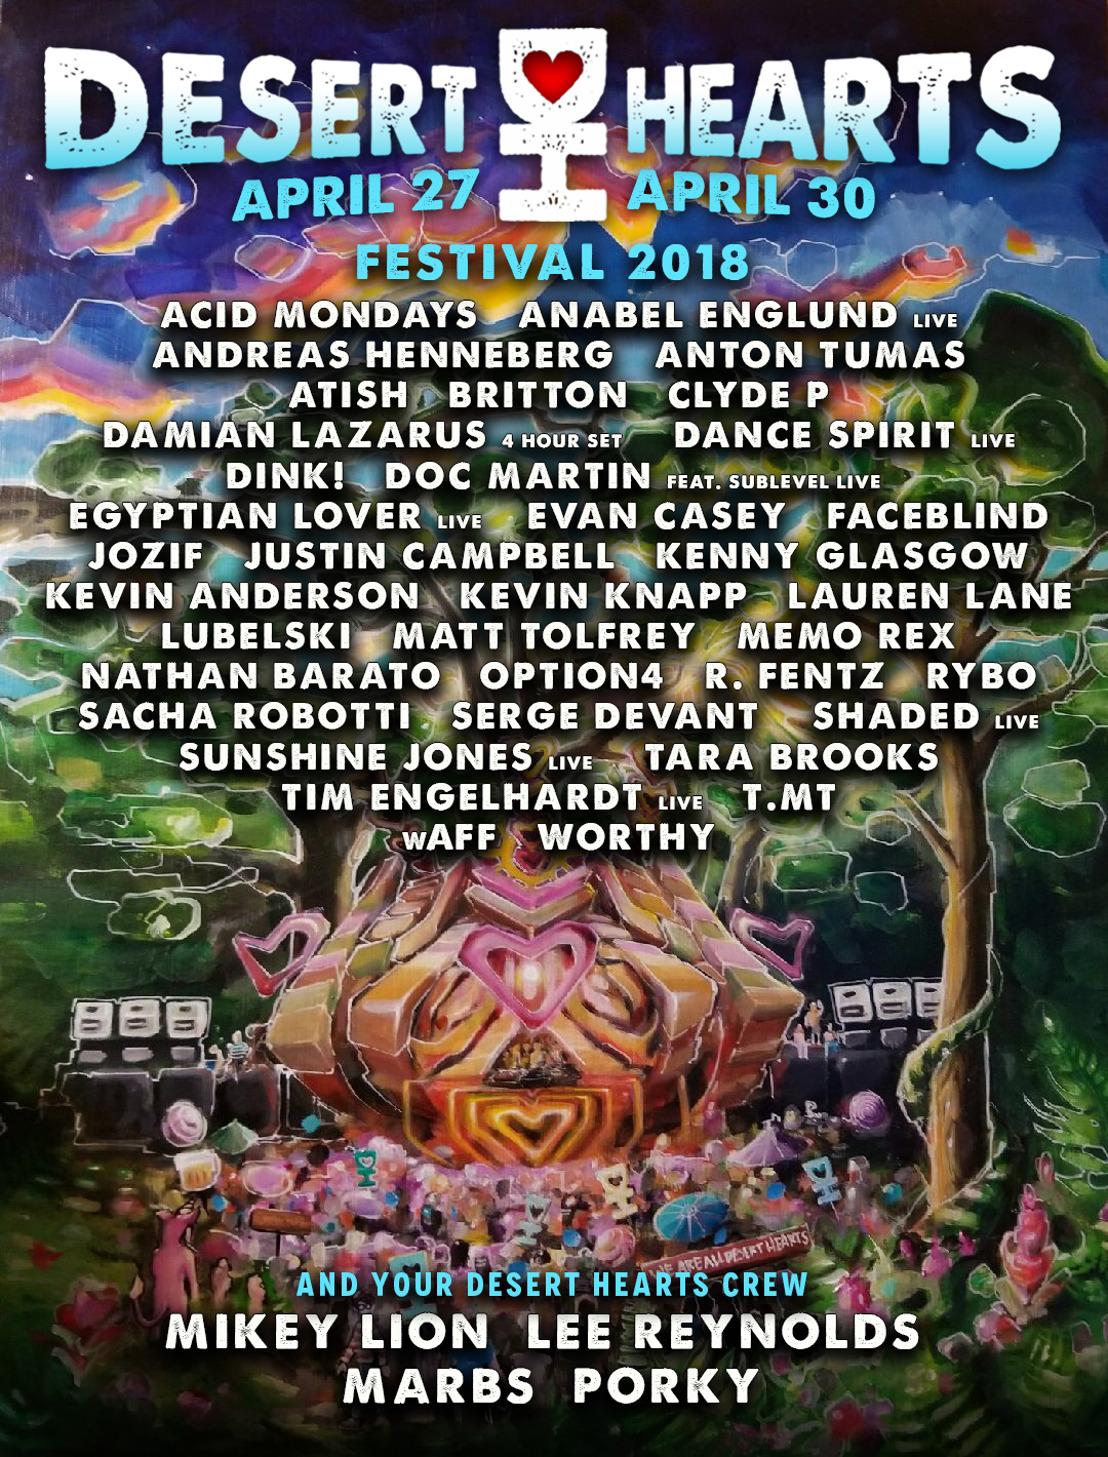 Desert Hearts Announces Lineup for Spring 2018 Festival